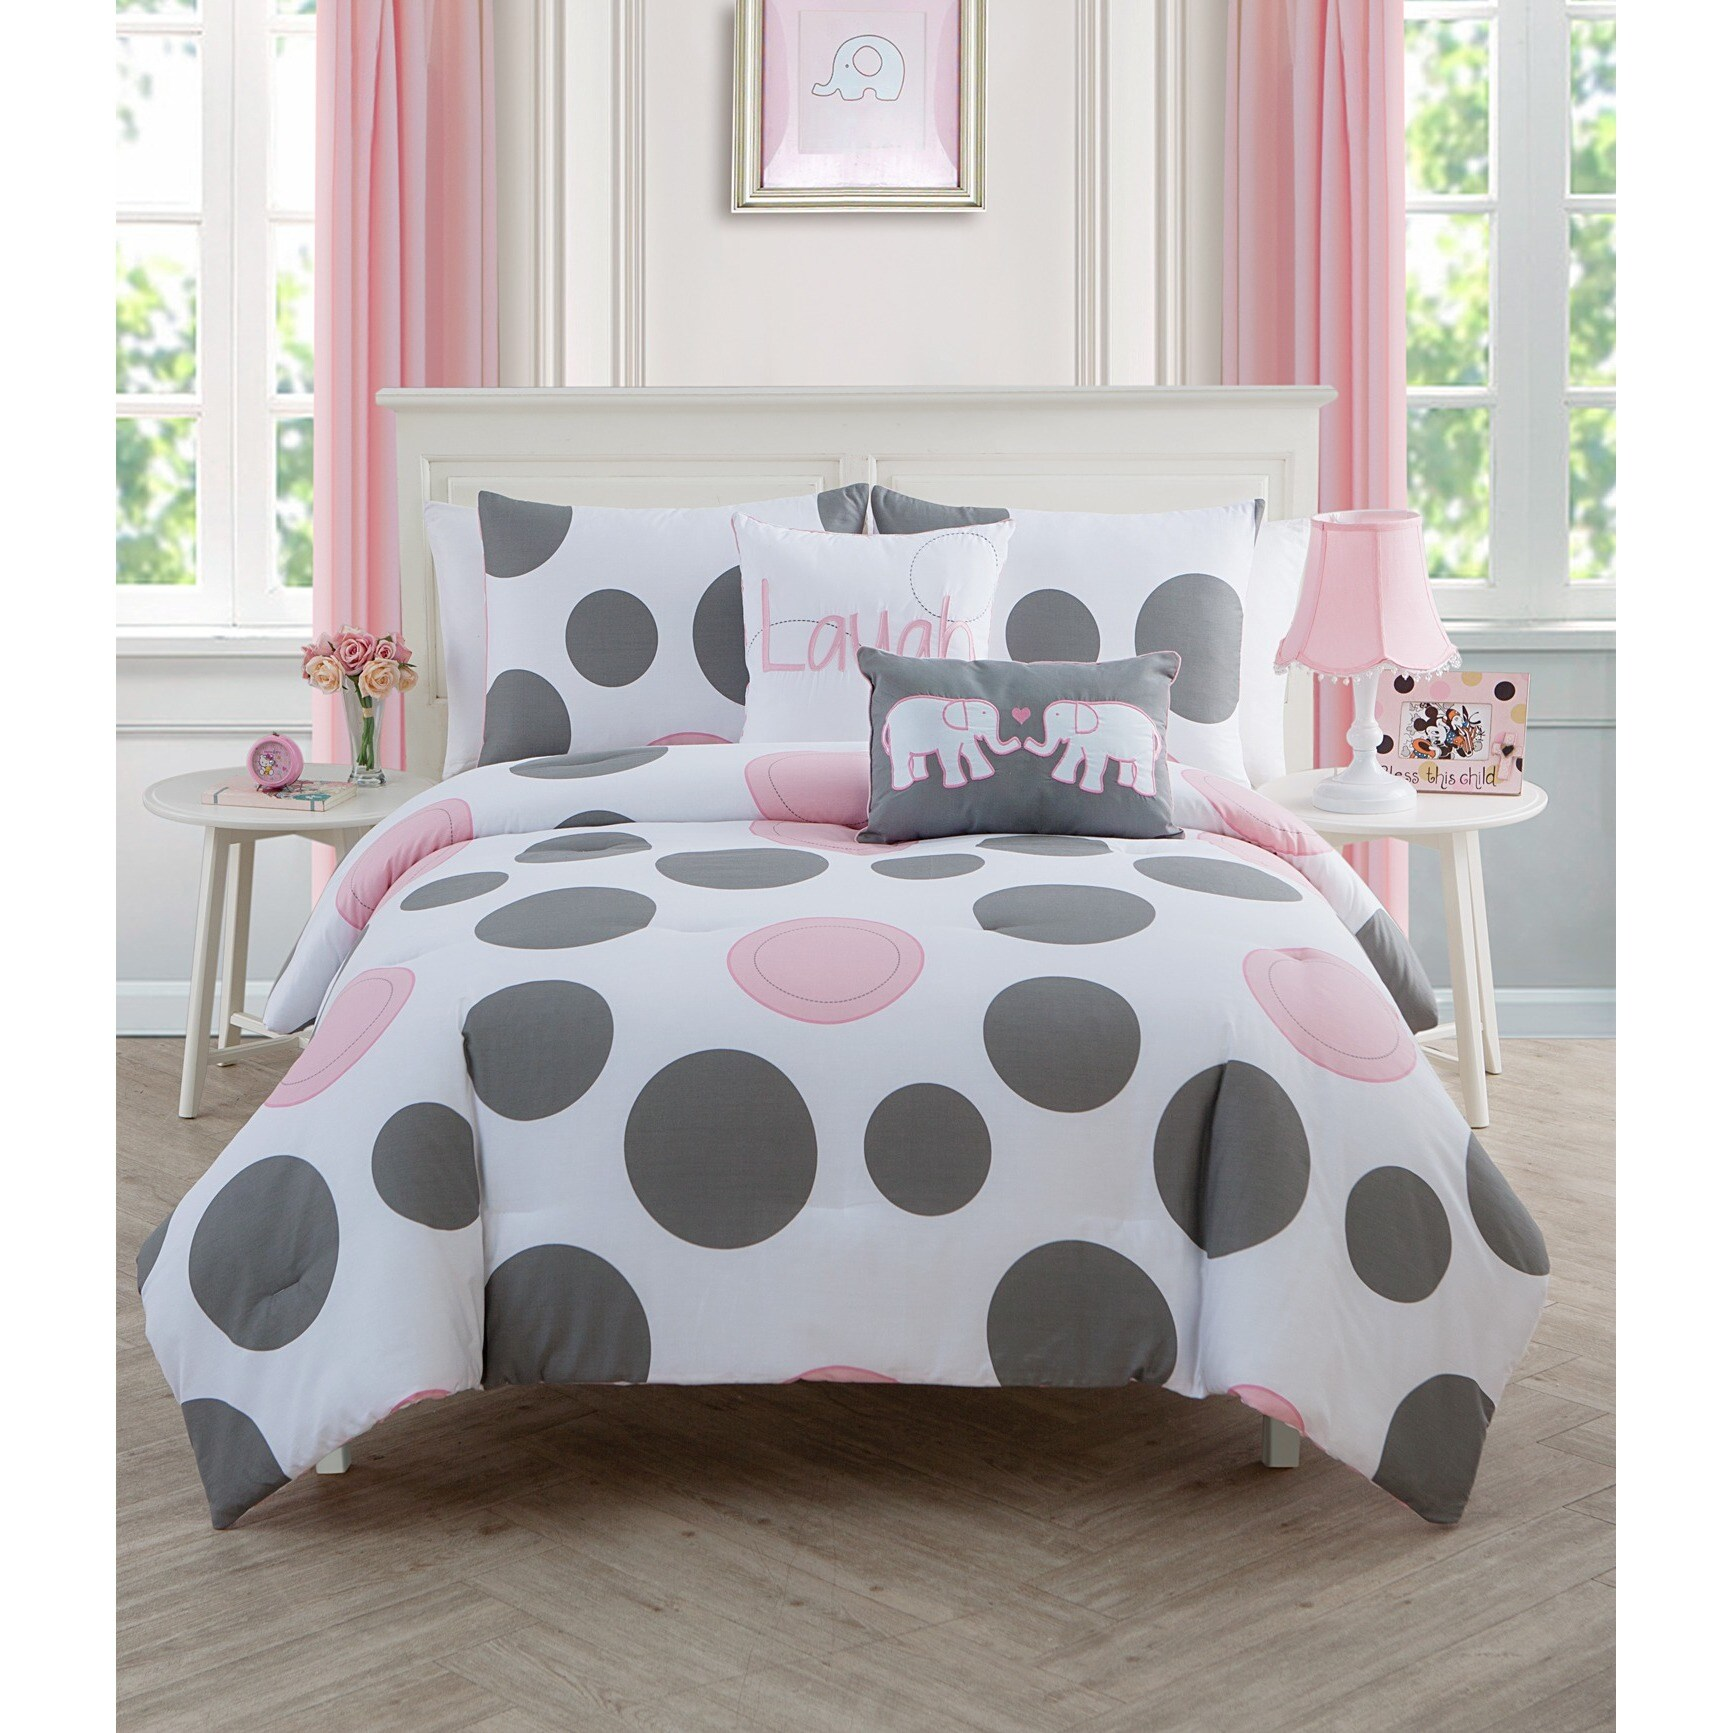 3-Piece Victoria Classics Company PPD-3CS-FULL-MC-P5 VCNY Parade Full Comforter Set Pink